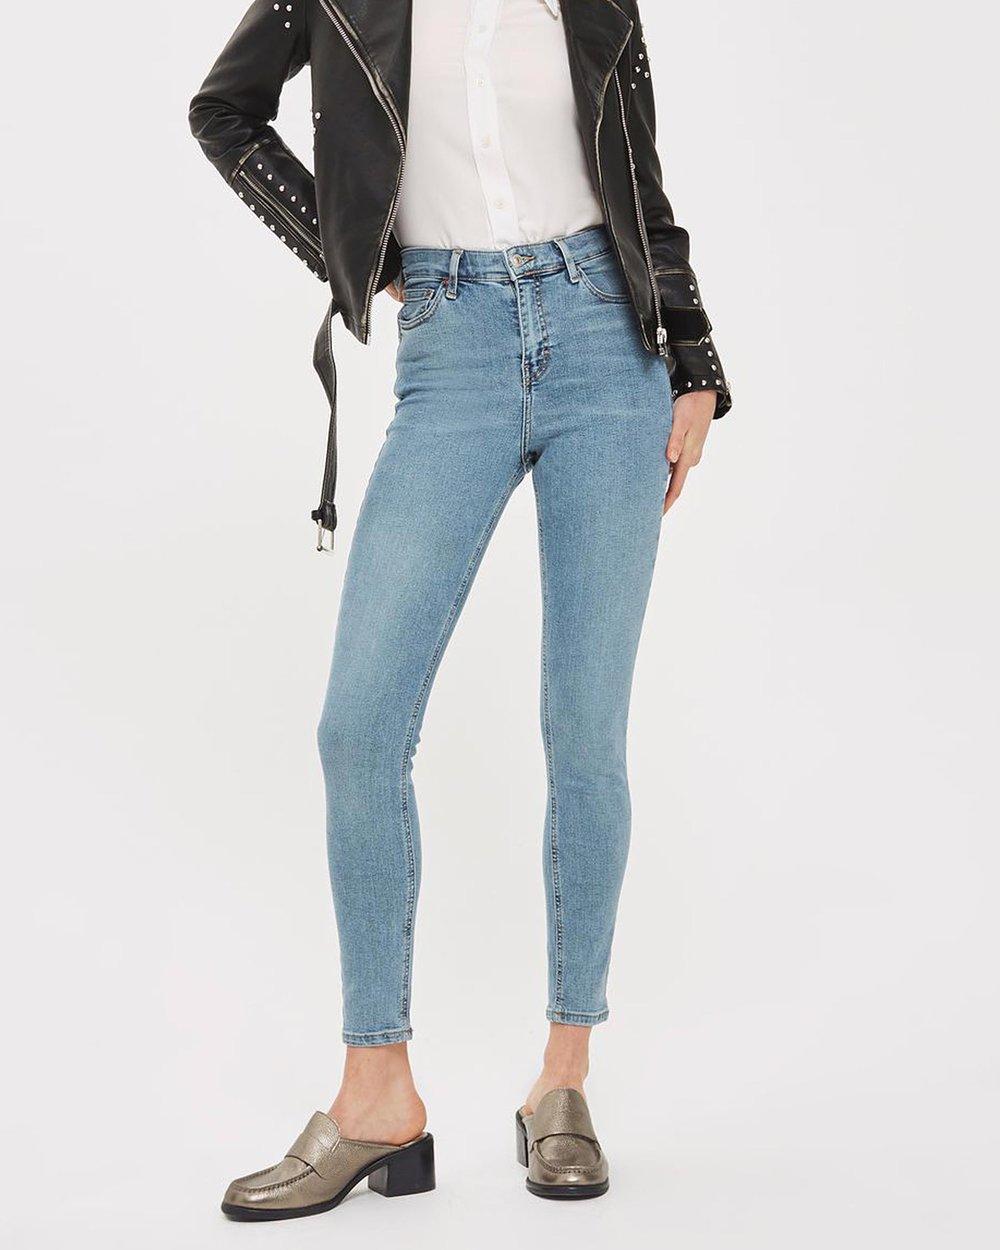 8ddfec11b MOTO Winter Jamie Jeans by TOPSHOP Online | THE ICONIC | Australia